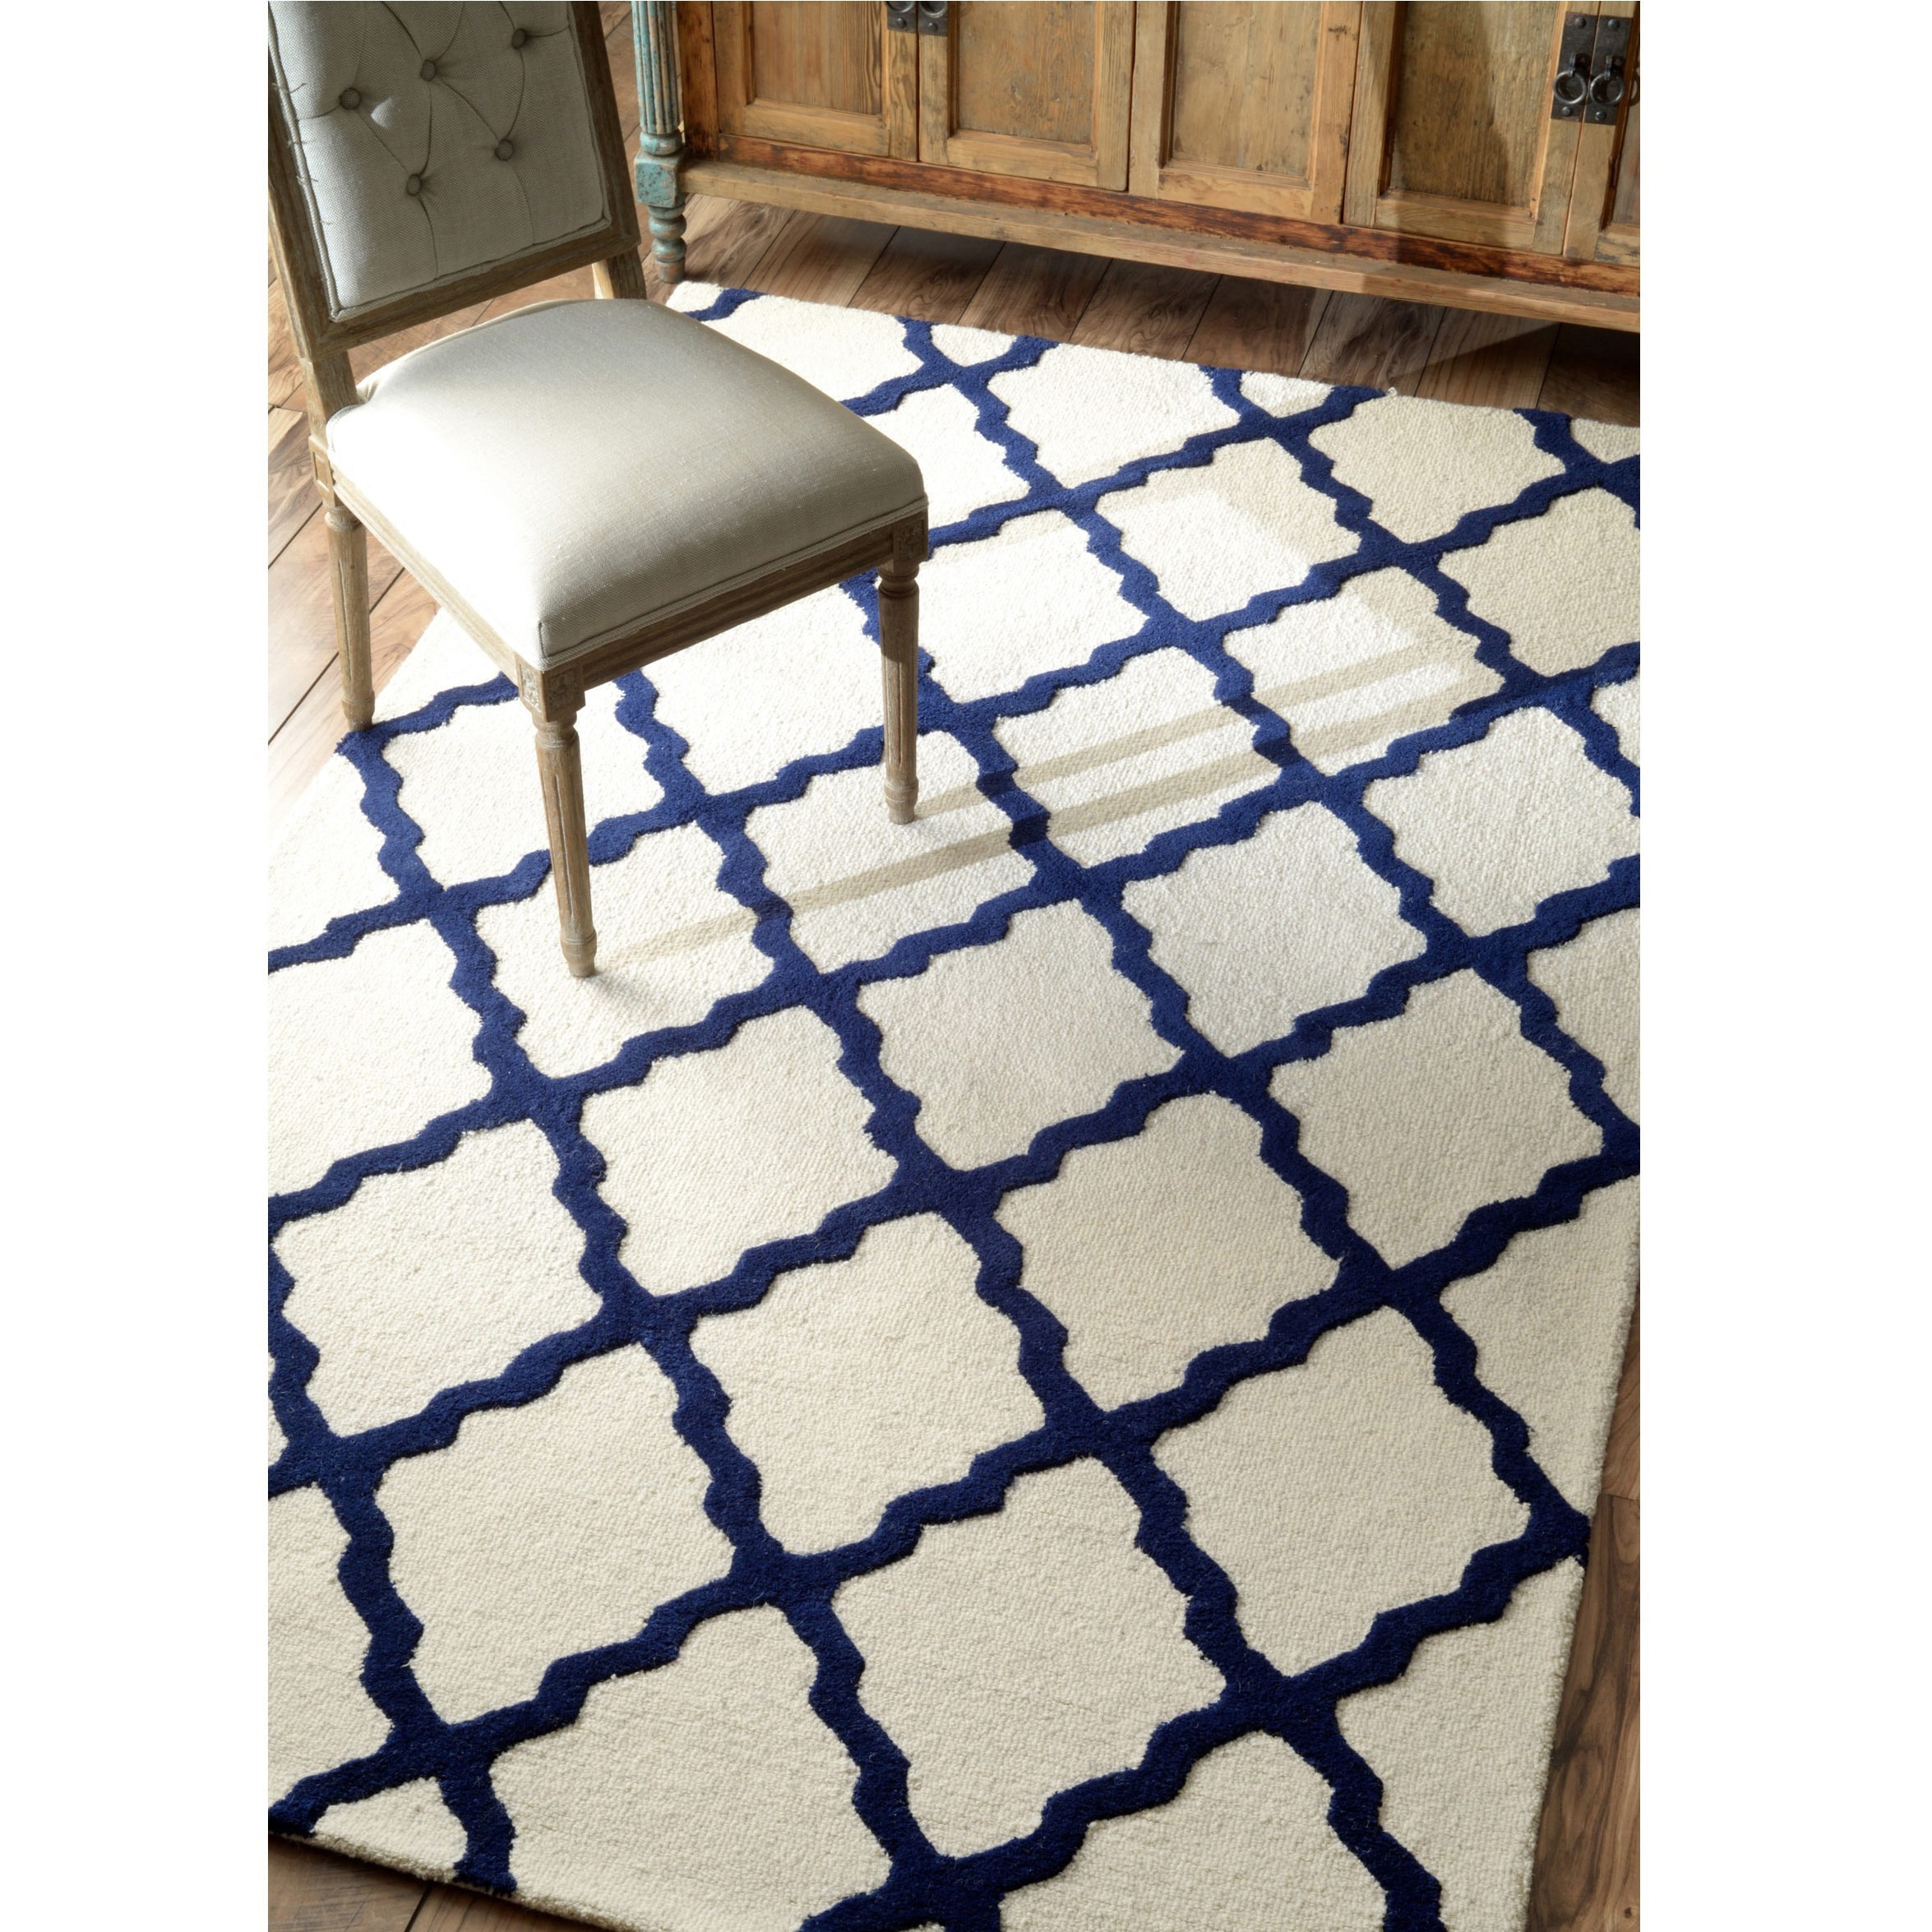 Nuloom Handmade Moroccan Trellis Wool Area Rug 5 X 8